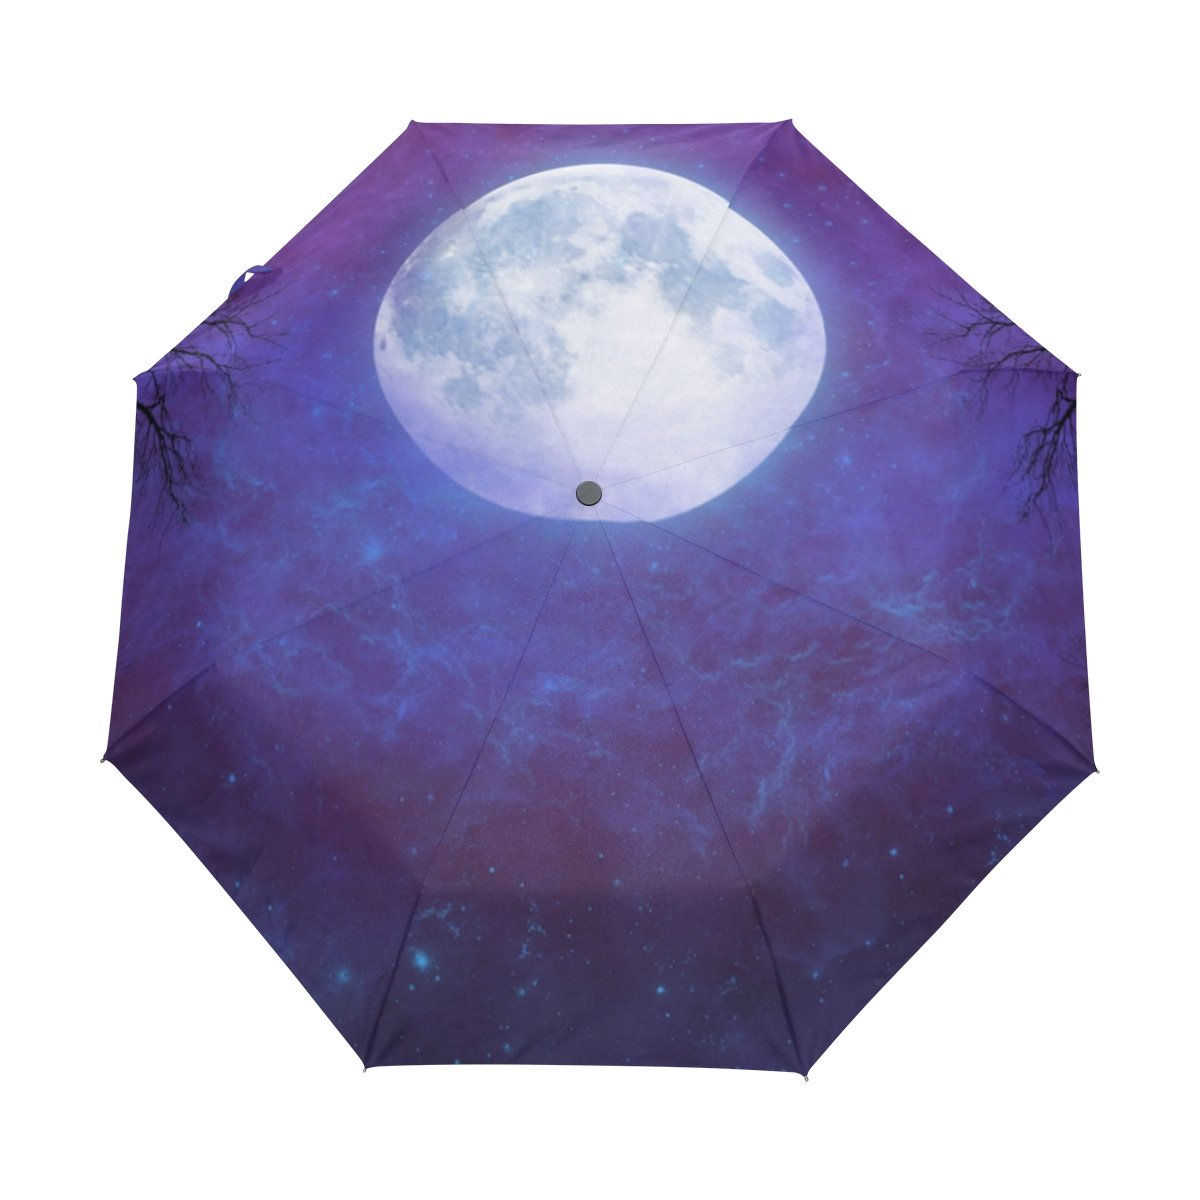 128ca022f7 durable modeling DOENR Compact Travel Umbrella Lighting Moon Sun and Rain  Auto Open Close Umbrellas Lightweight